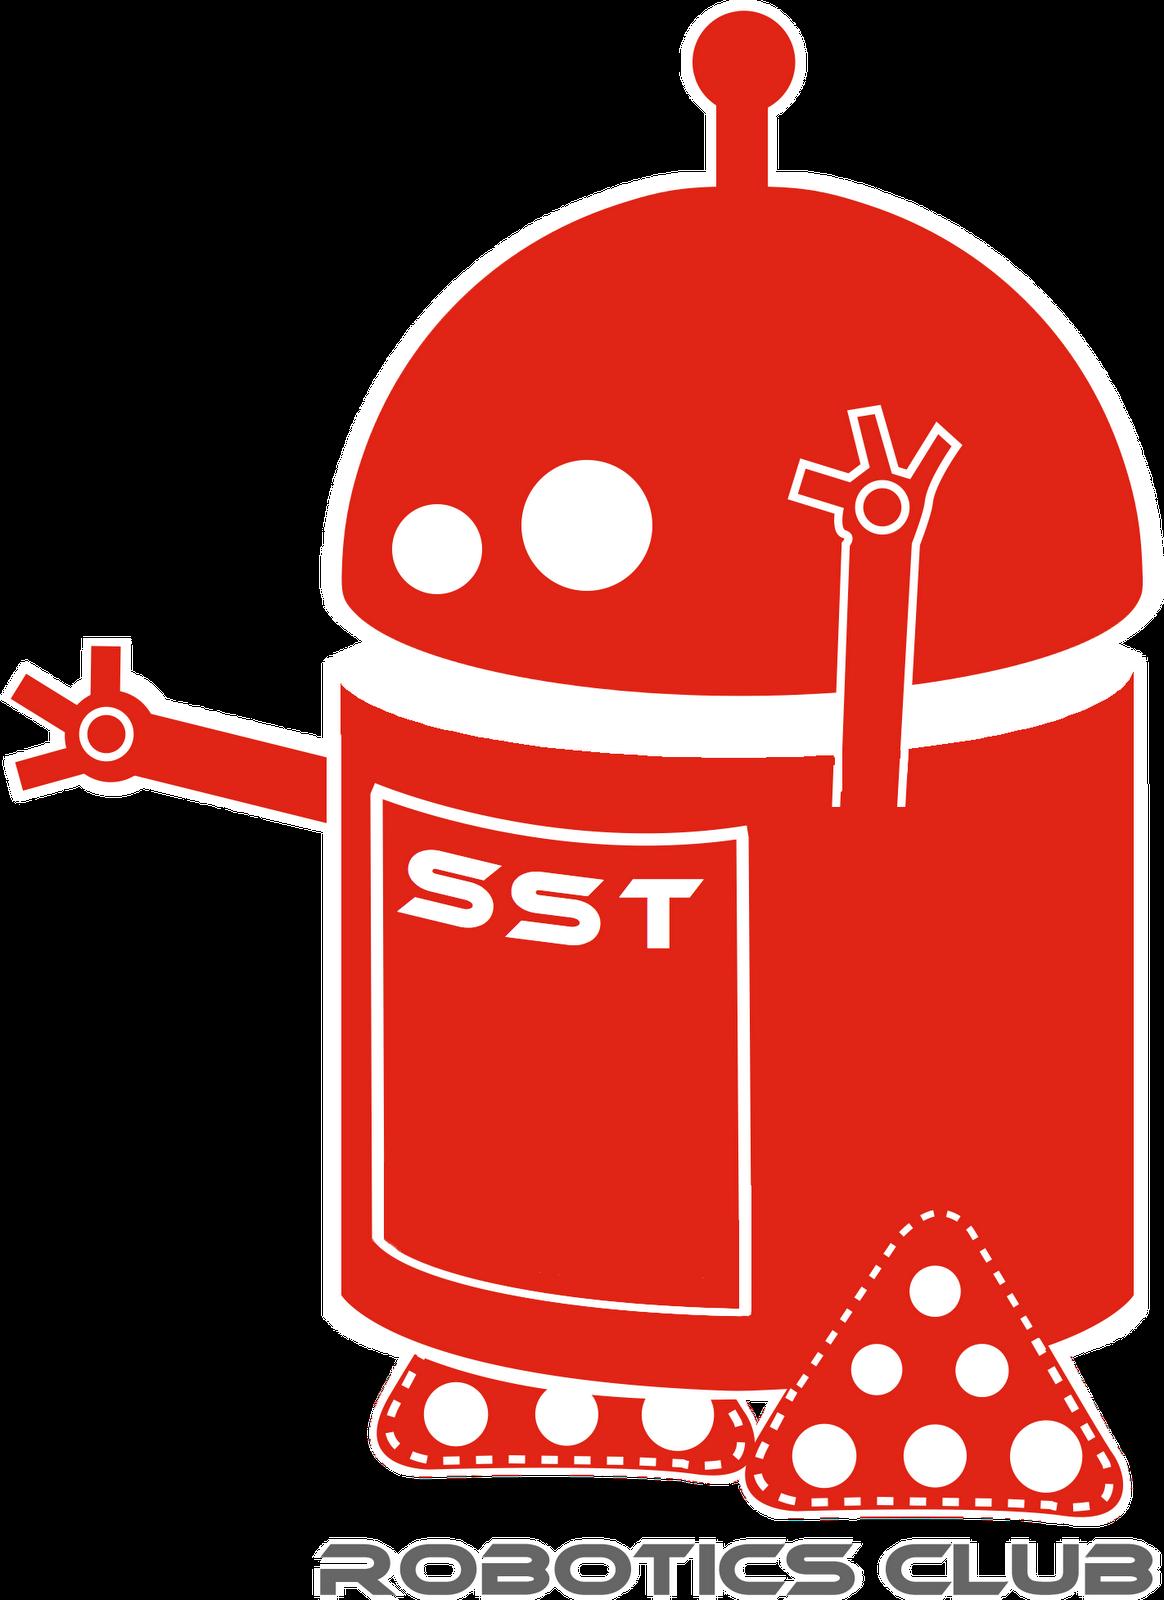 Club Robotics Robotics Club Logo Logo Design Pinterest